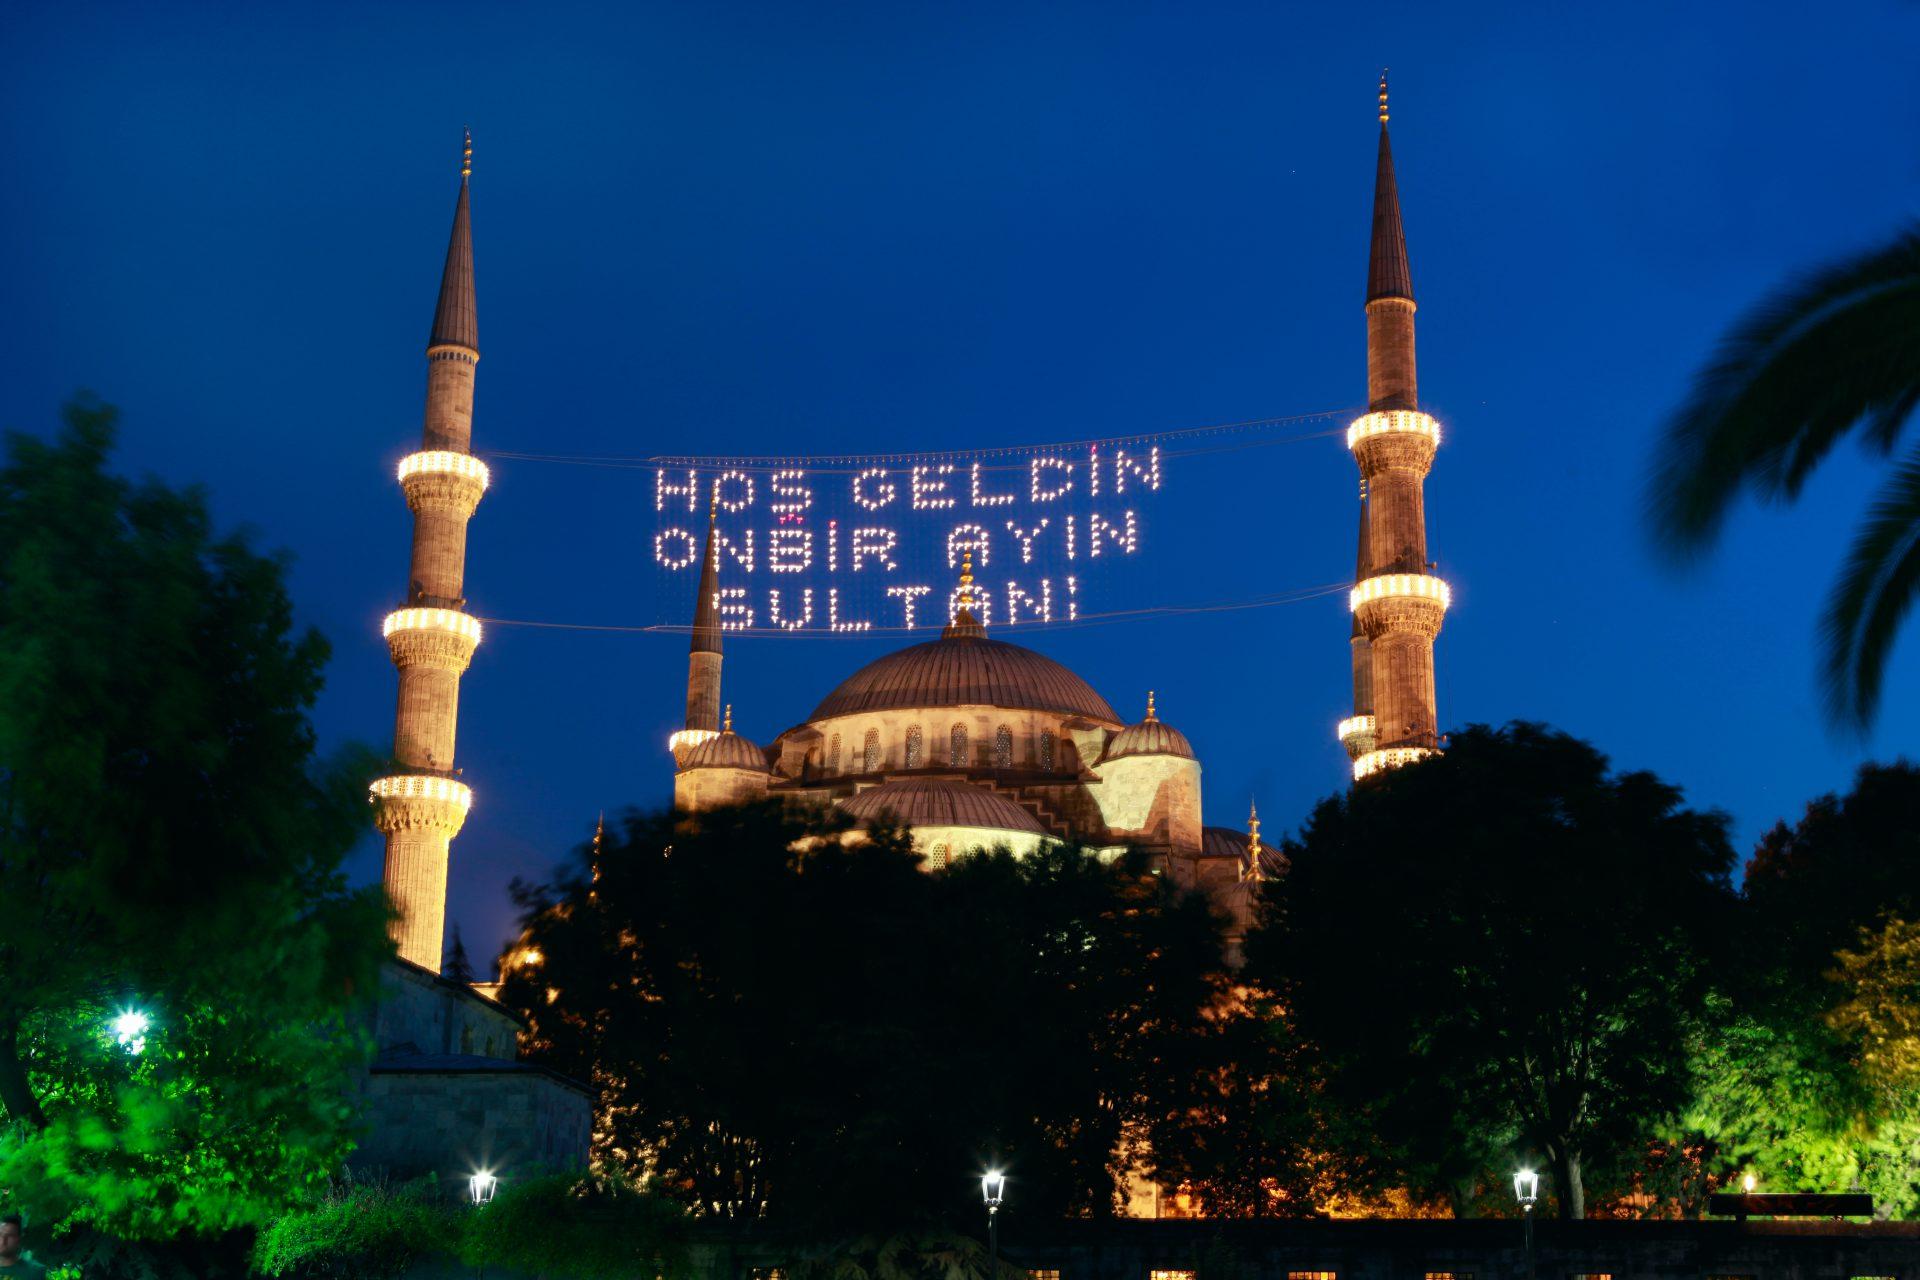 İftara ne kadar kaldı? İstanbul, İzmir, Ankara 13 Nisan 2021 iftar vakti, iftar saatleri